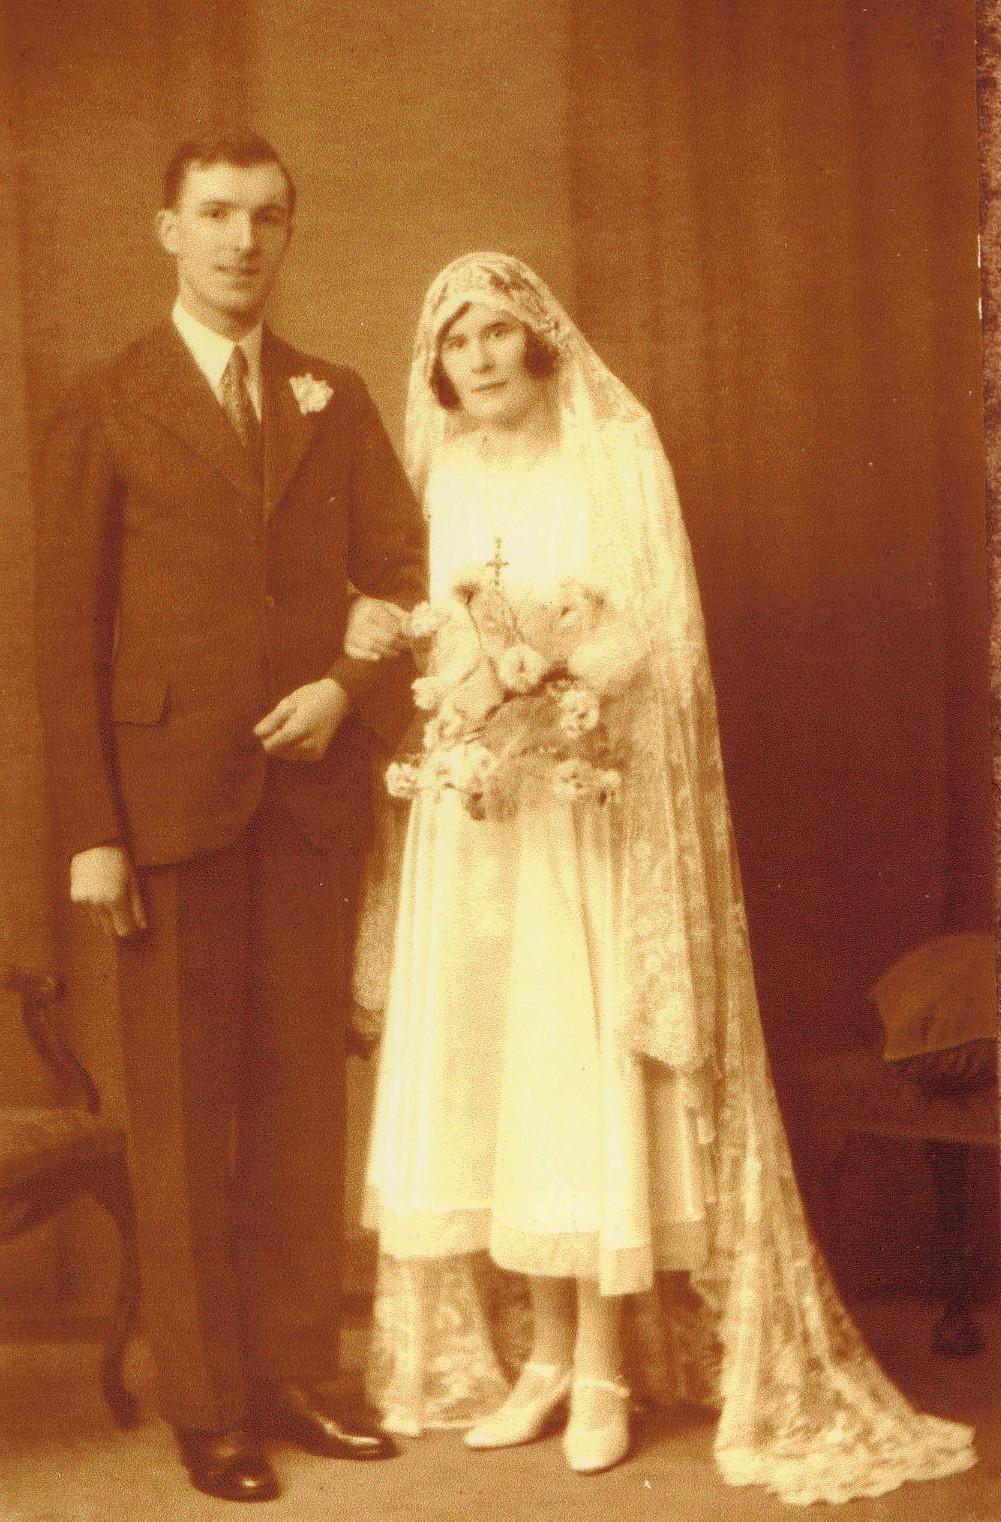 John Rowland Taylor & Dacia Kathleen Humphrey's We